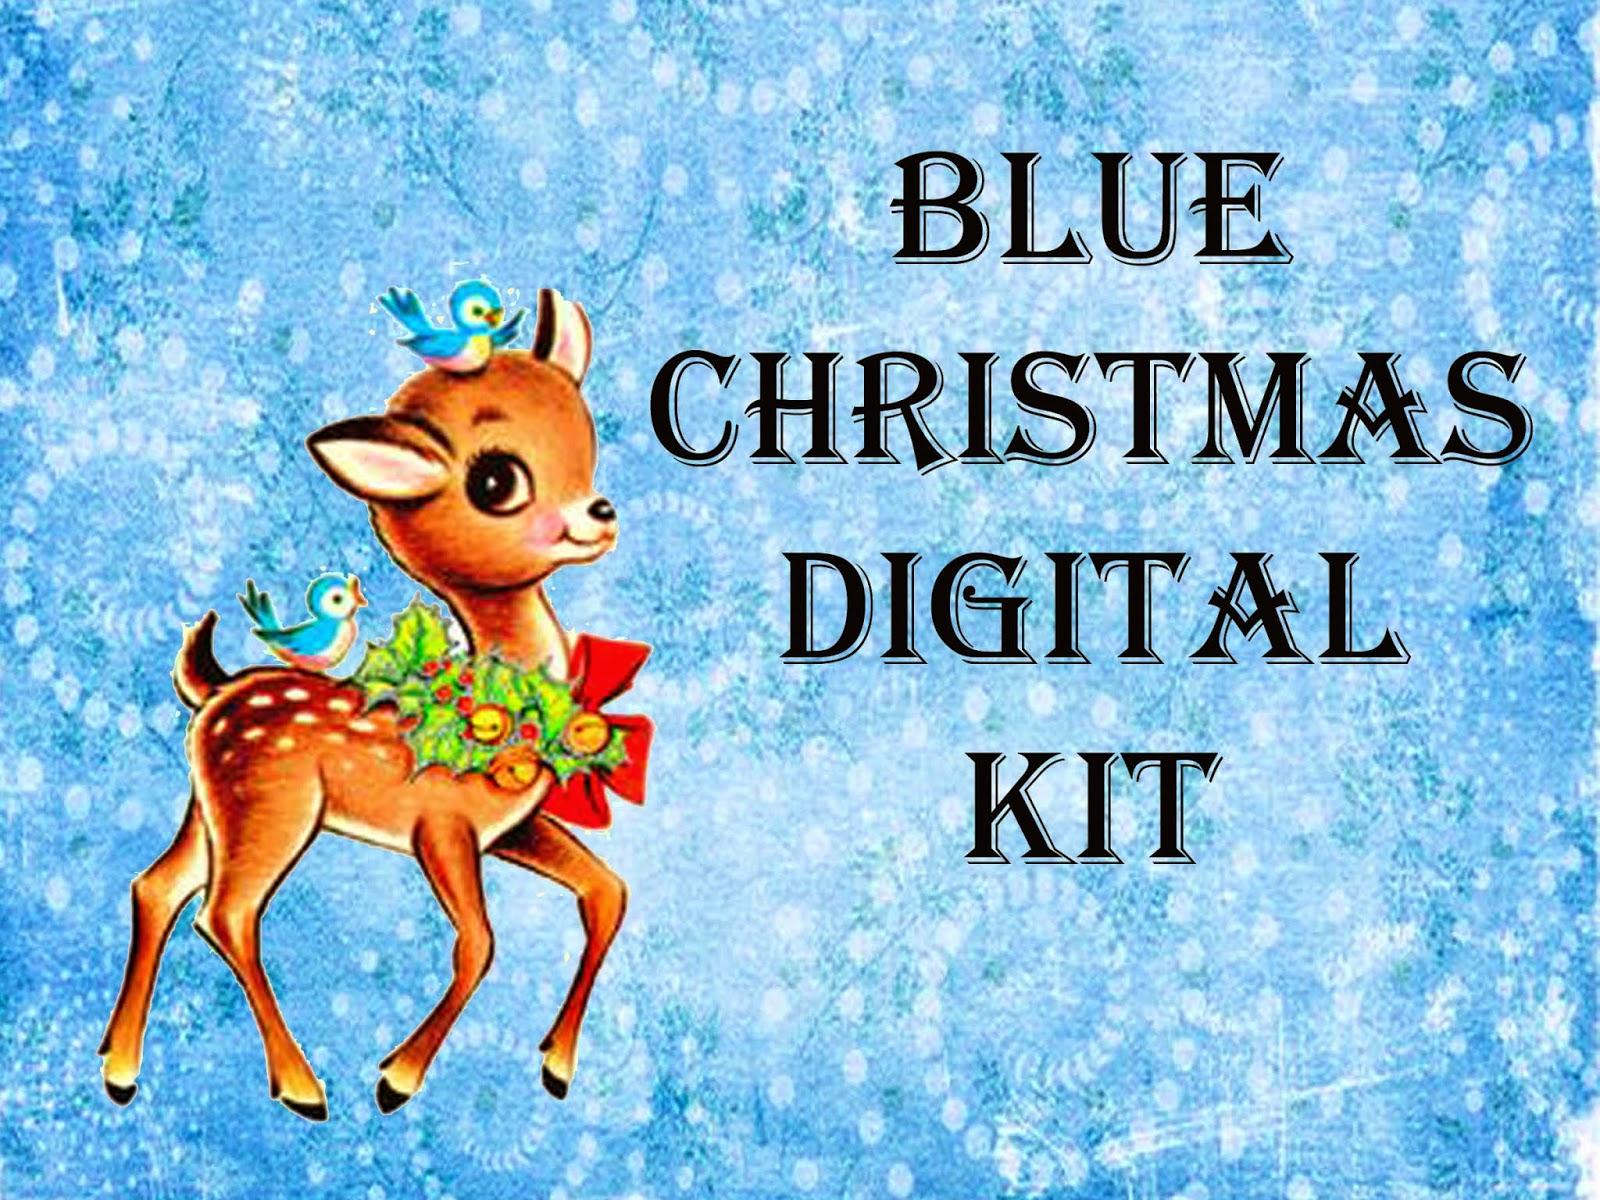 http://3.bp.blogspot.com/-w4IUvagqOTE/VJ7n7VIj8LI/AAAAAAAAFW8/J-NuoD360MQ/s1600/blue+christmas+cvr.jpg